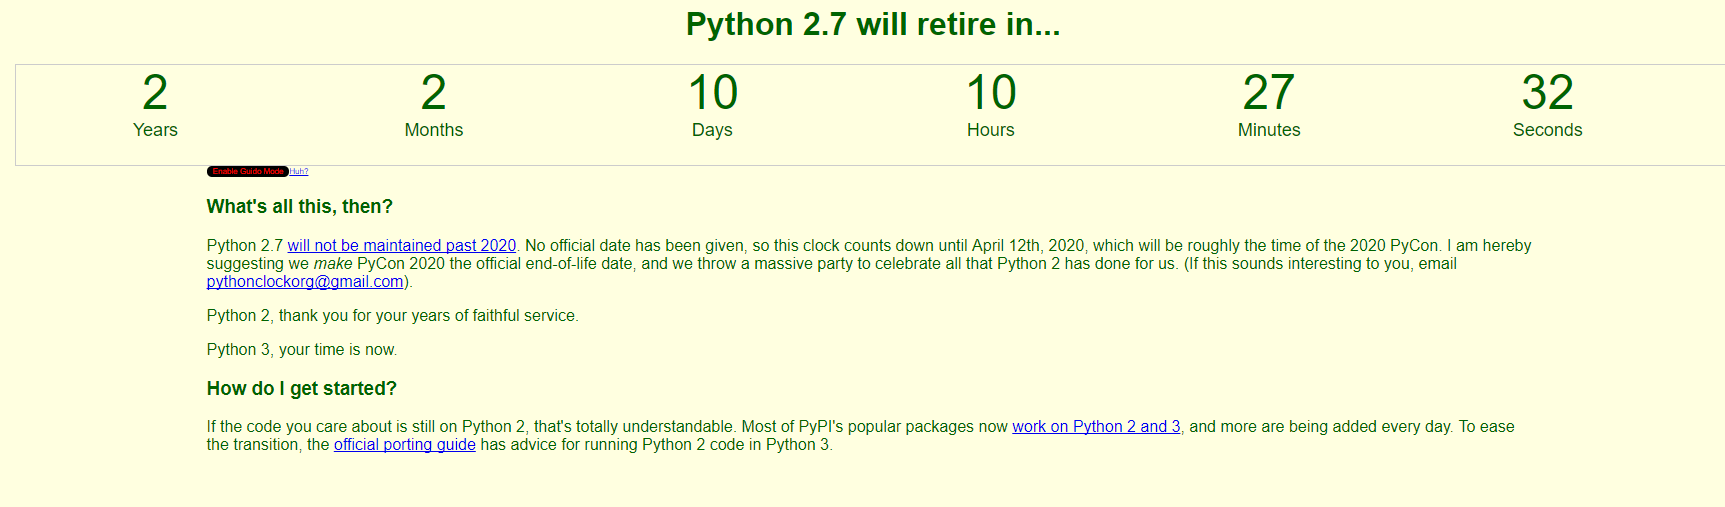 Running Python On Xbox One